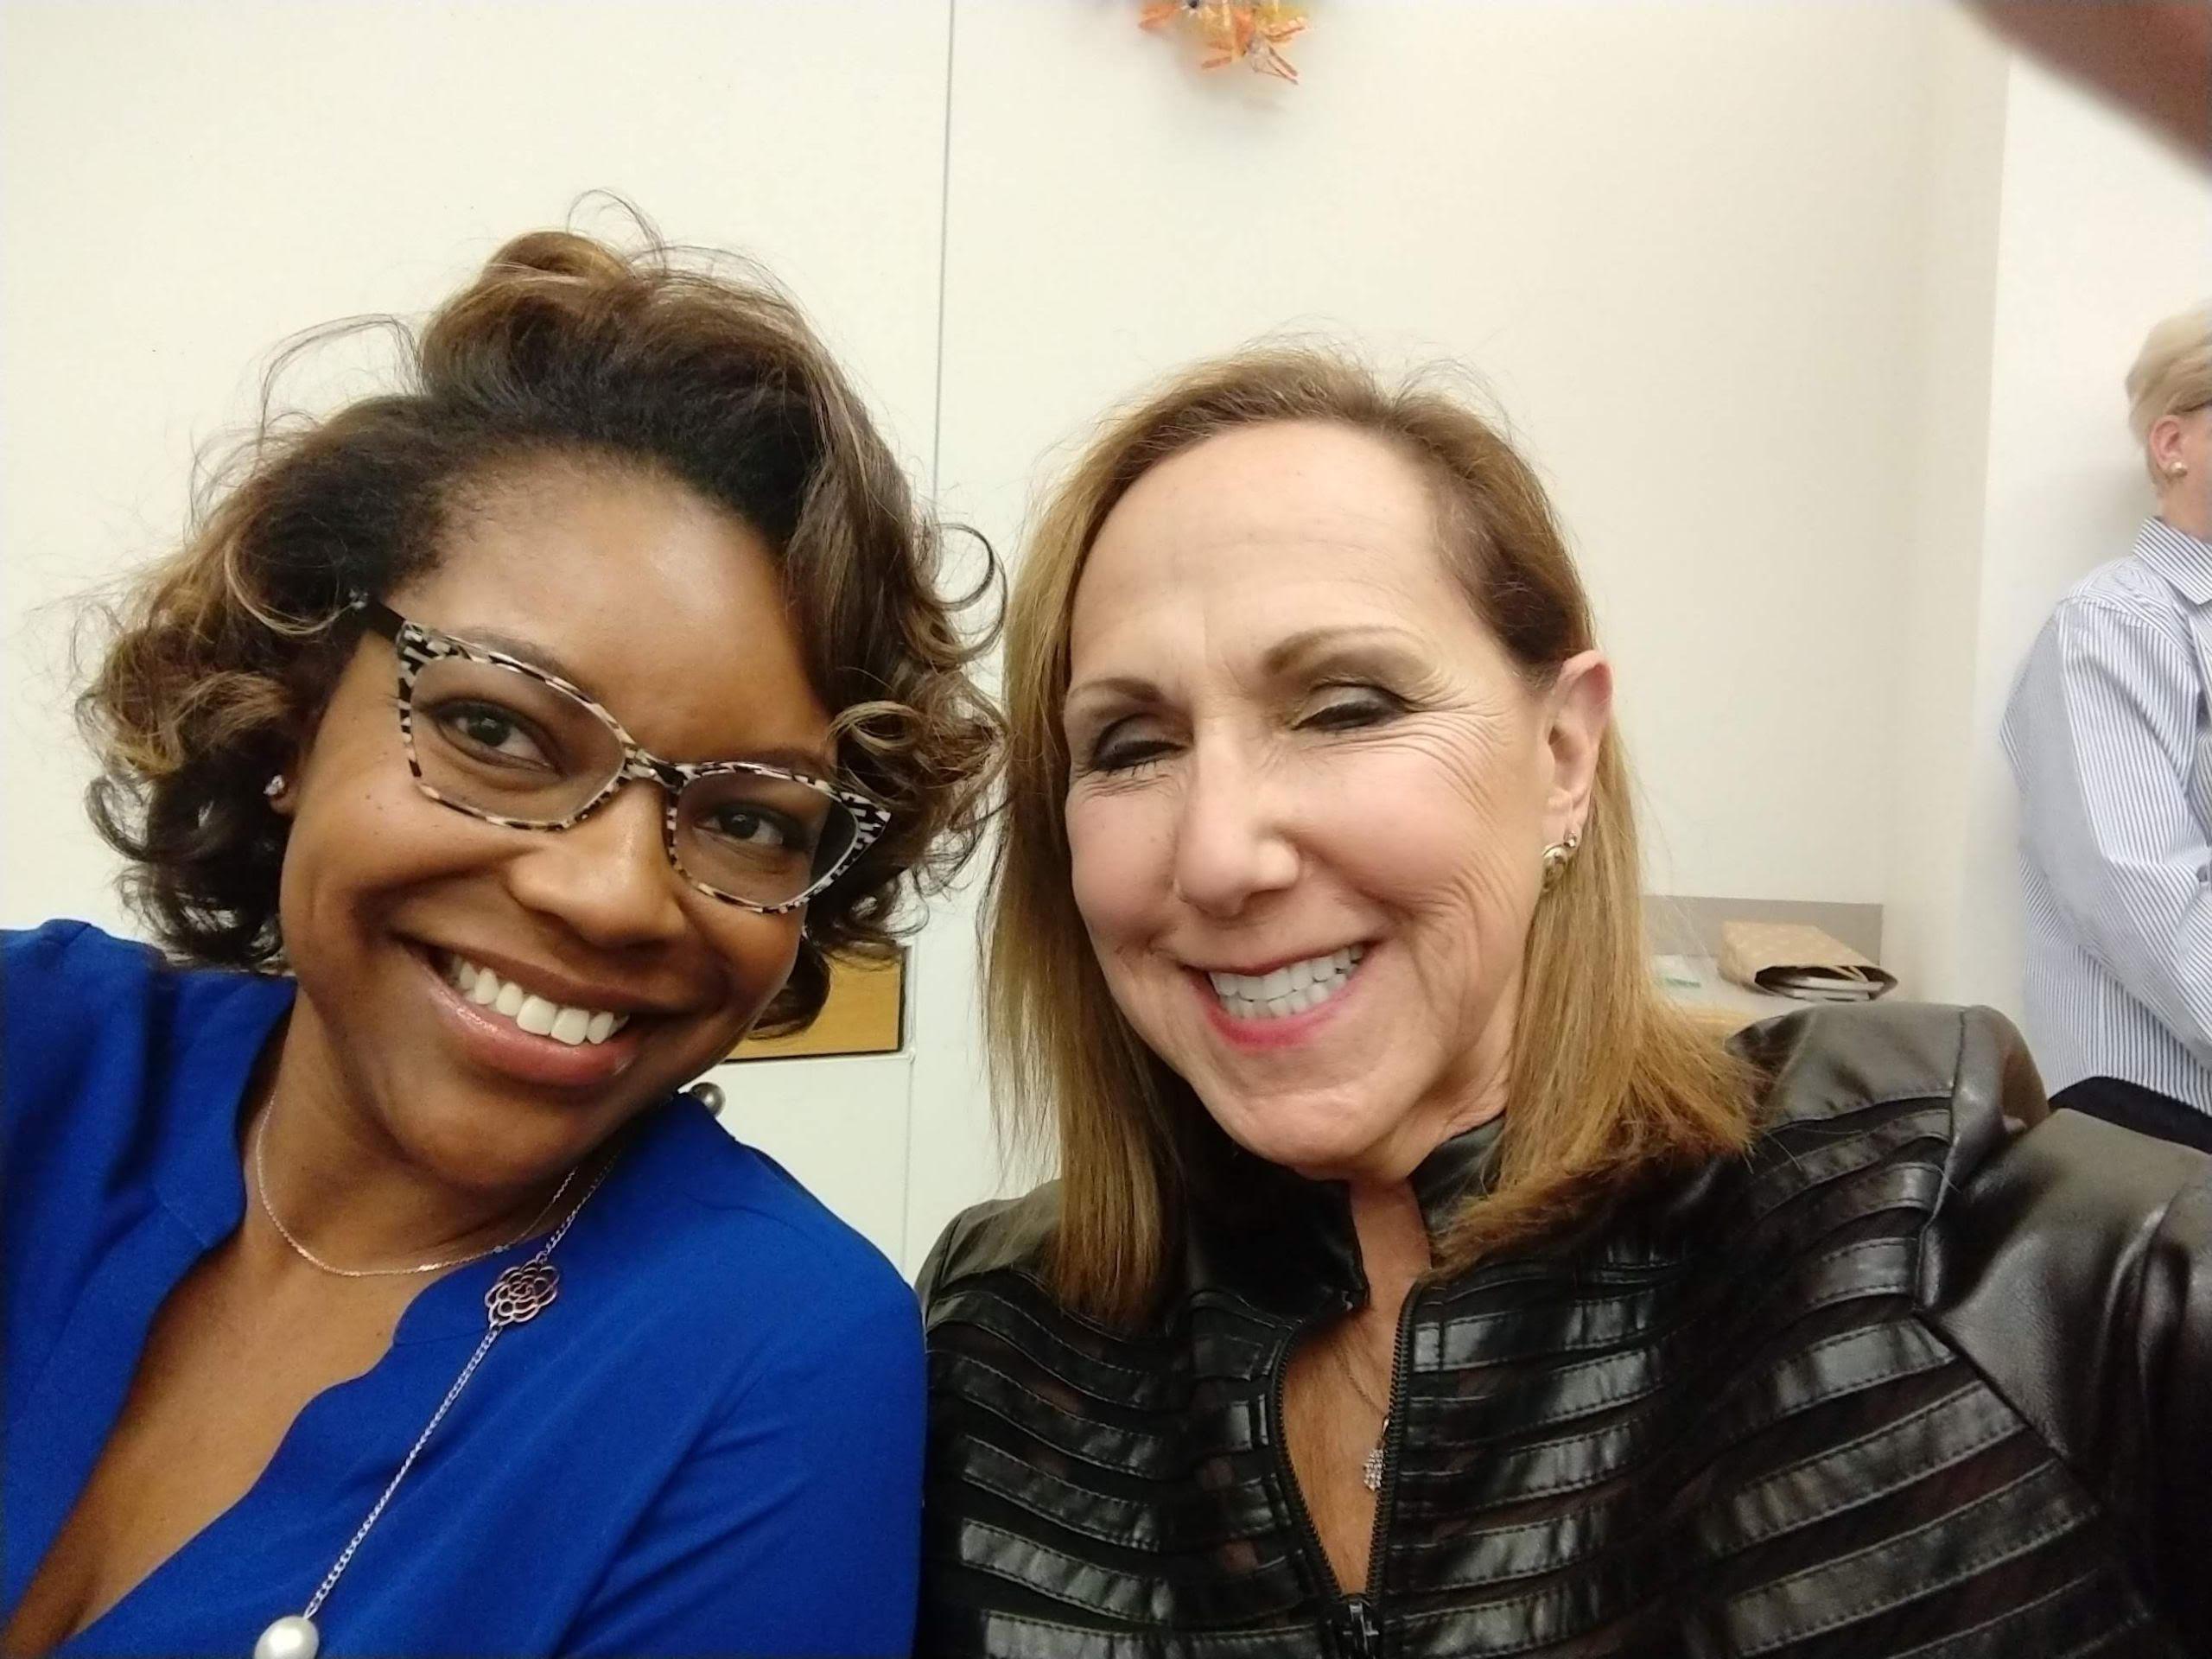 Leslie with Ohio House of Representatives, Emilia Sykes